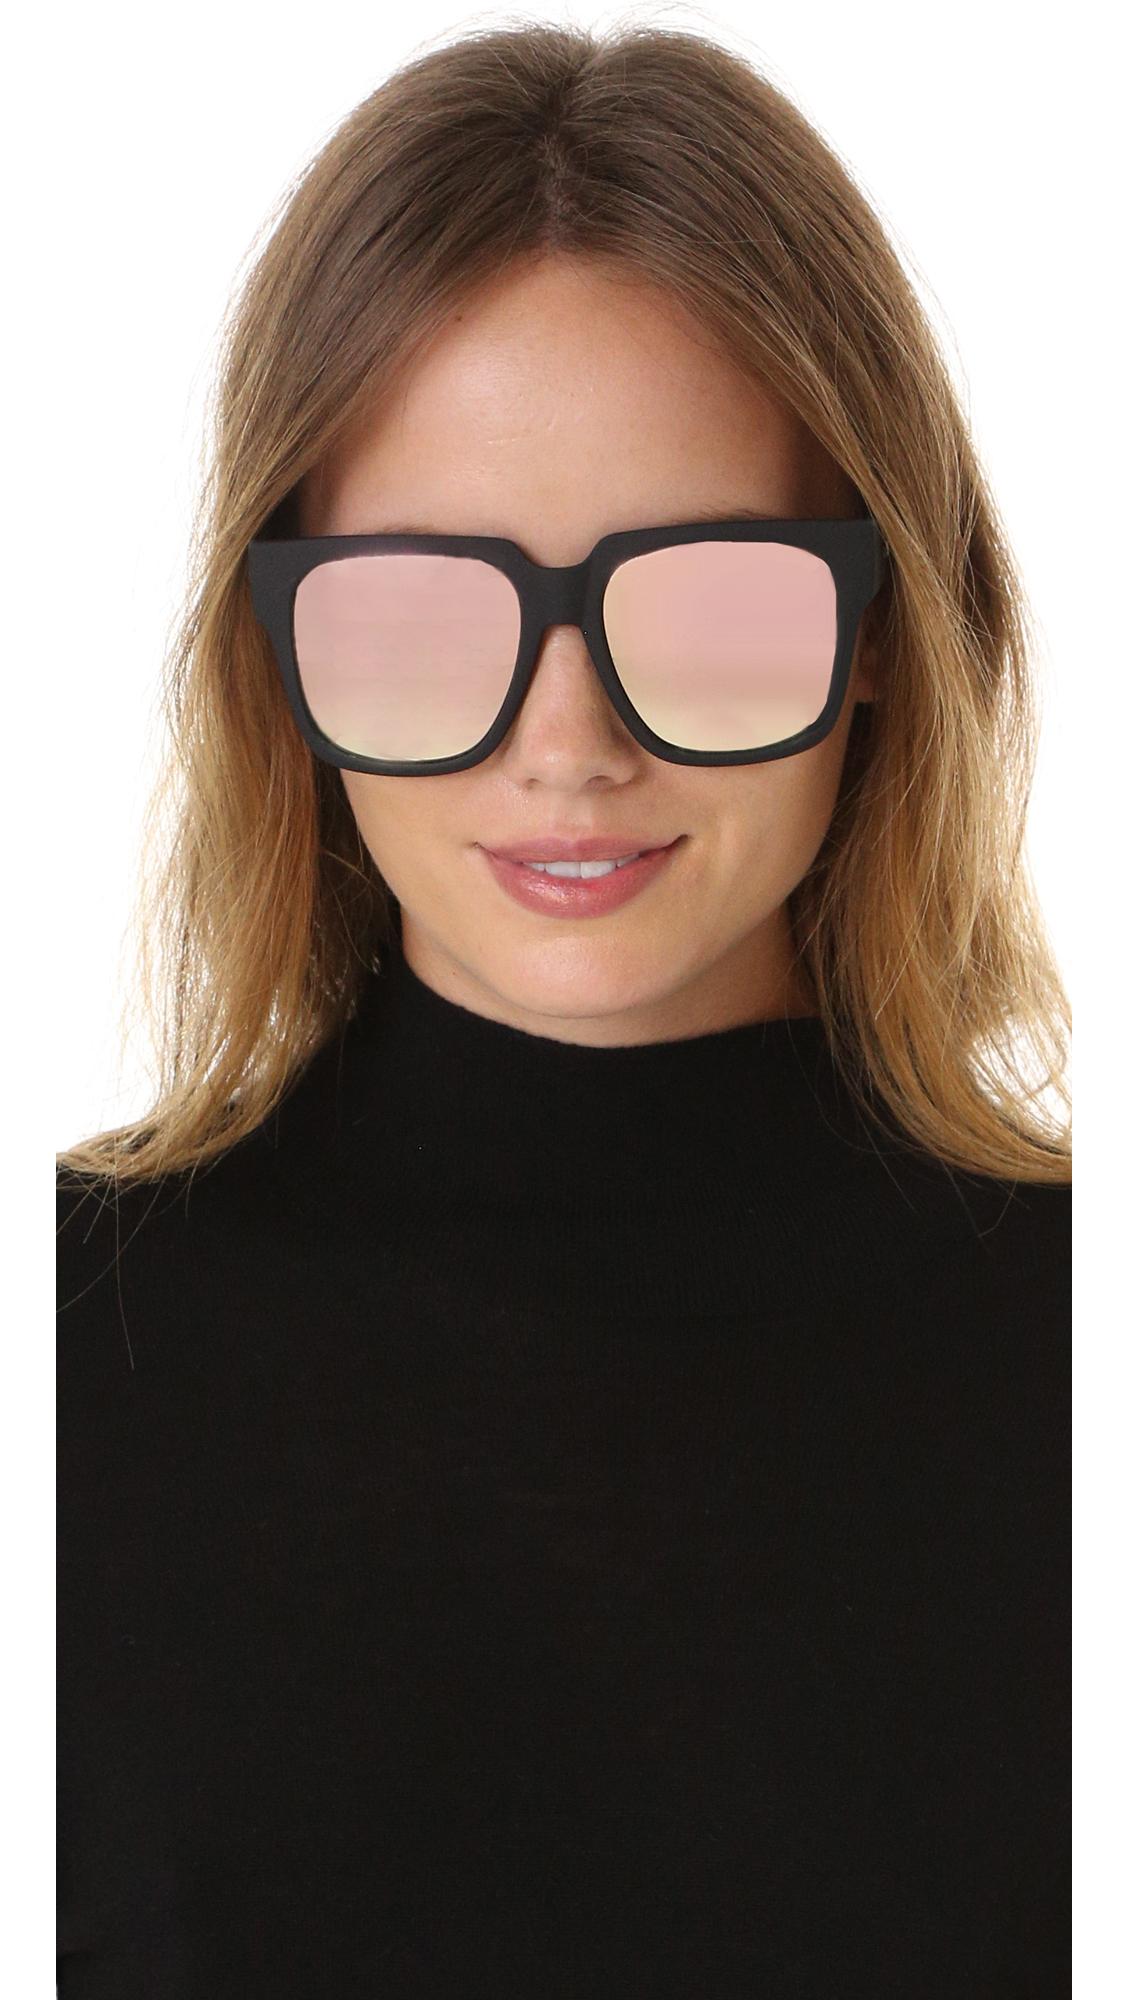 c3a894a93f Quay On the Prowl Sunglasses